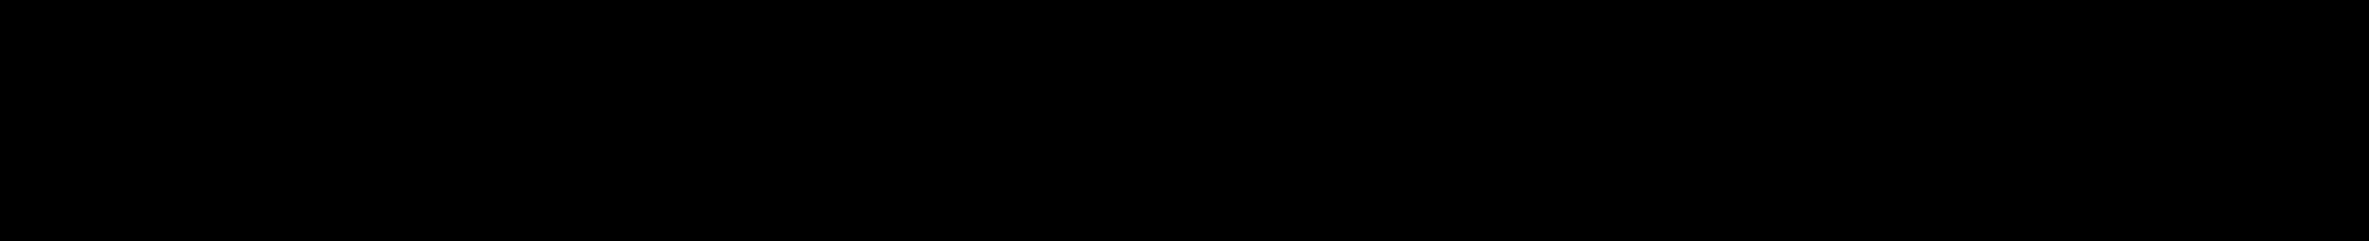 Museo Sans Condensed 100 Italic